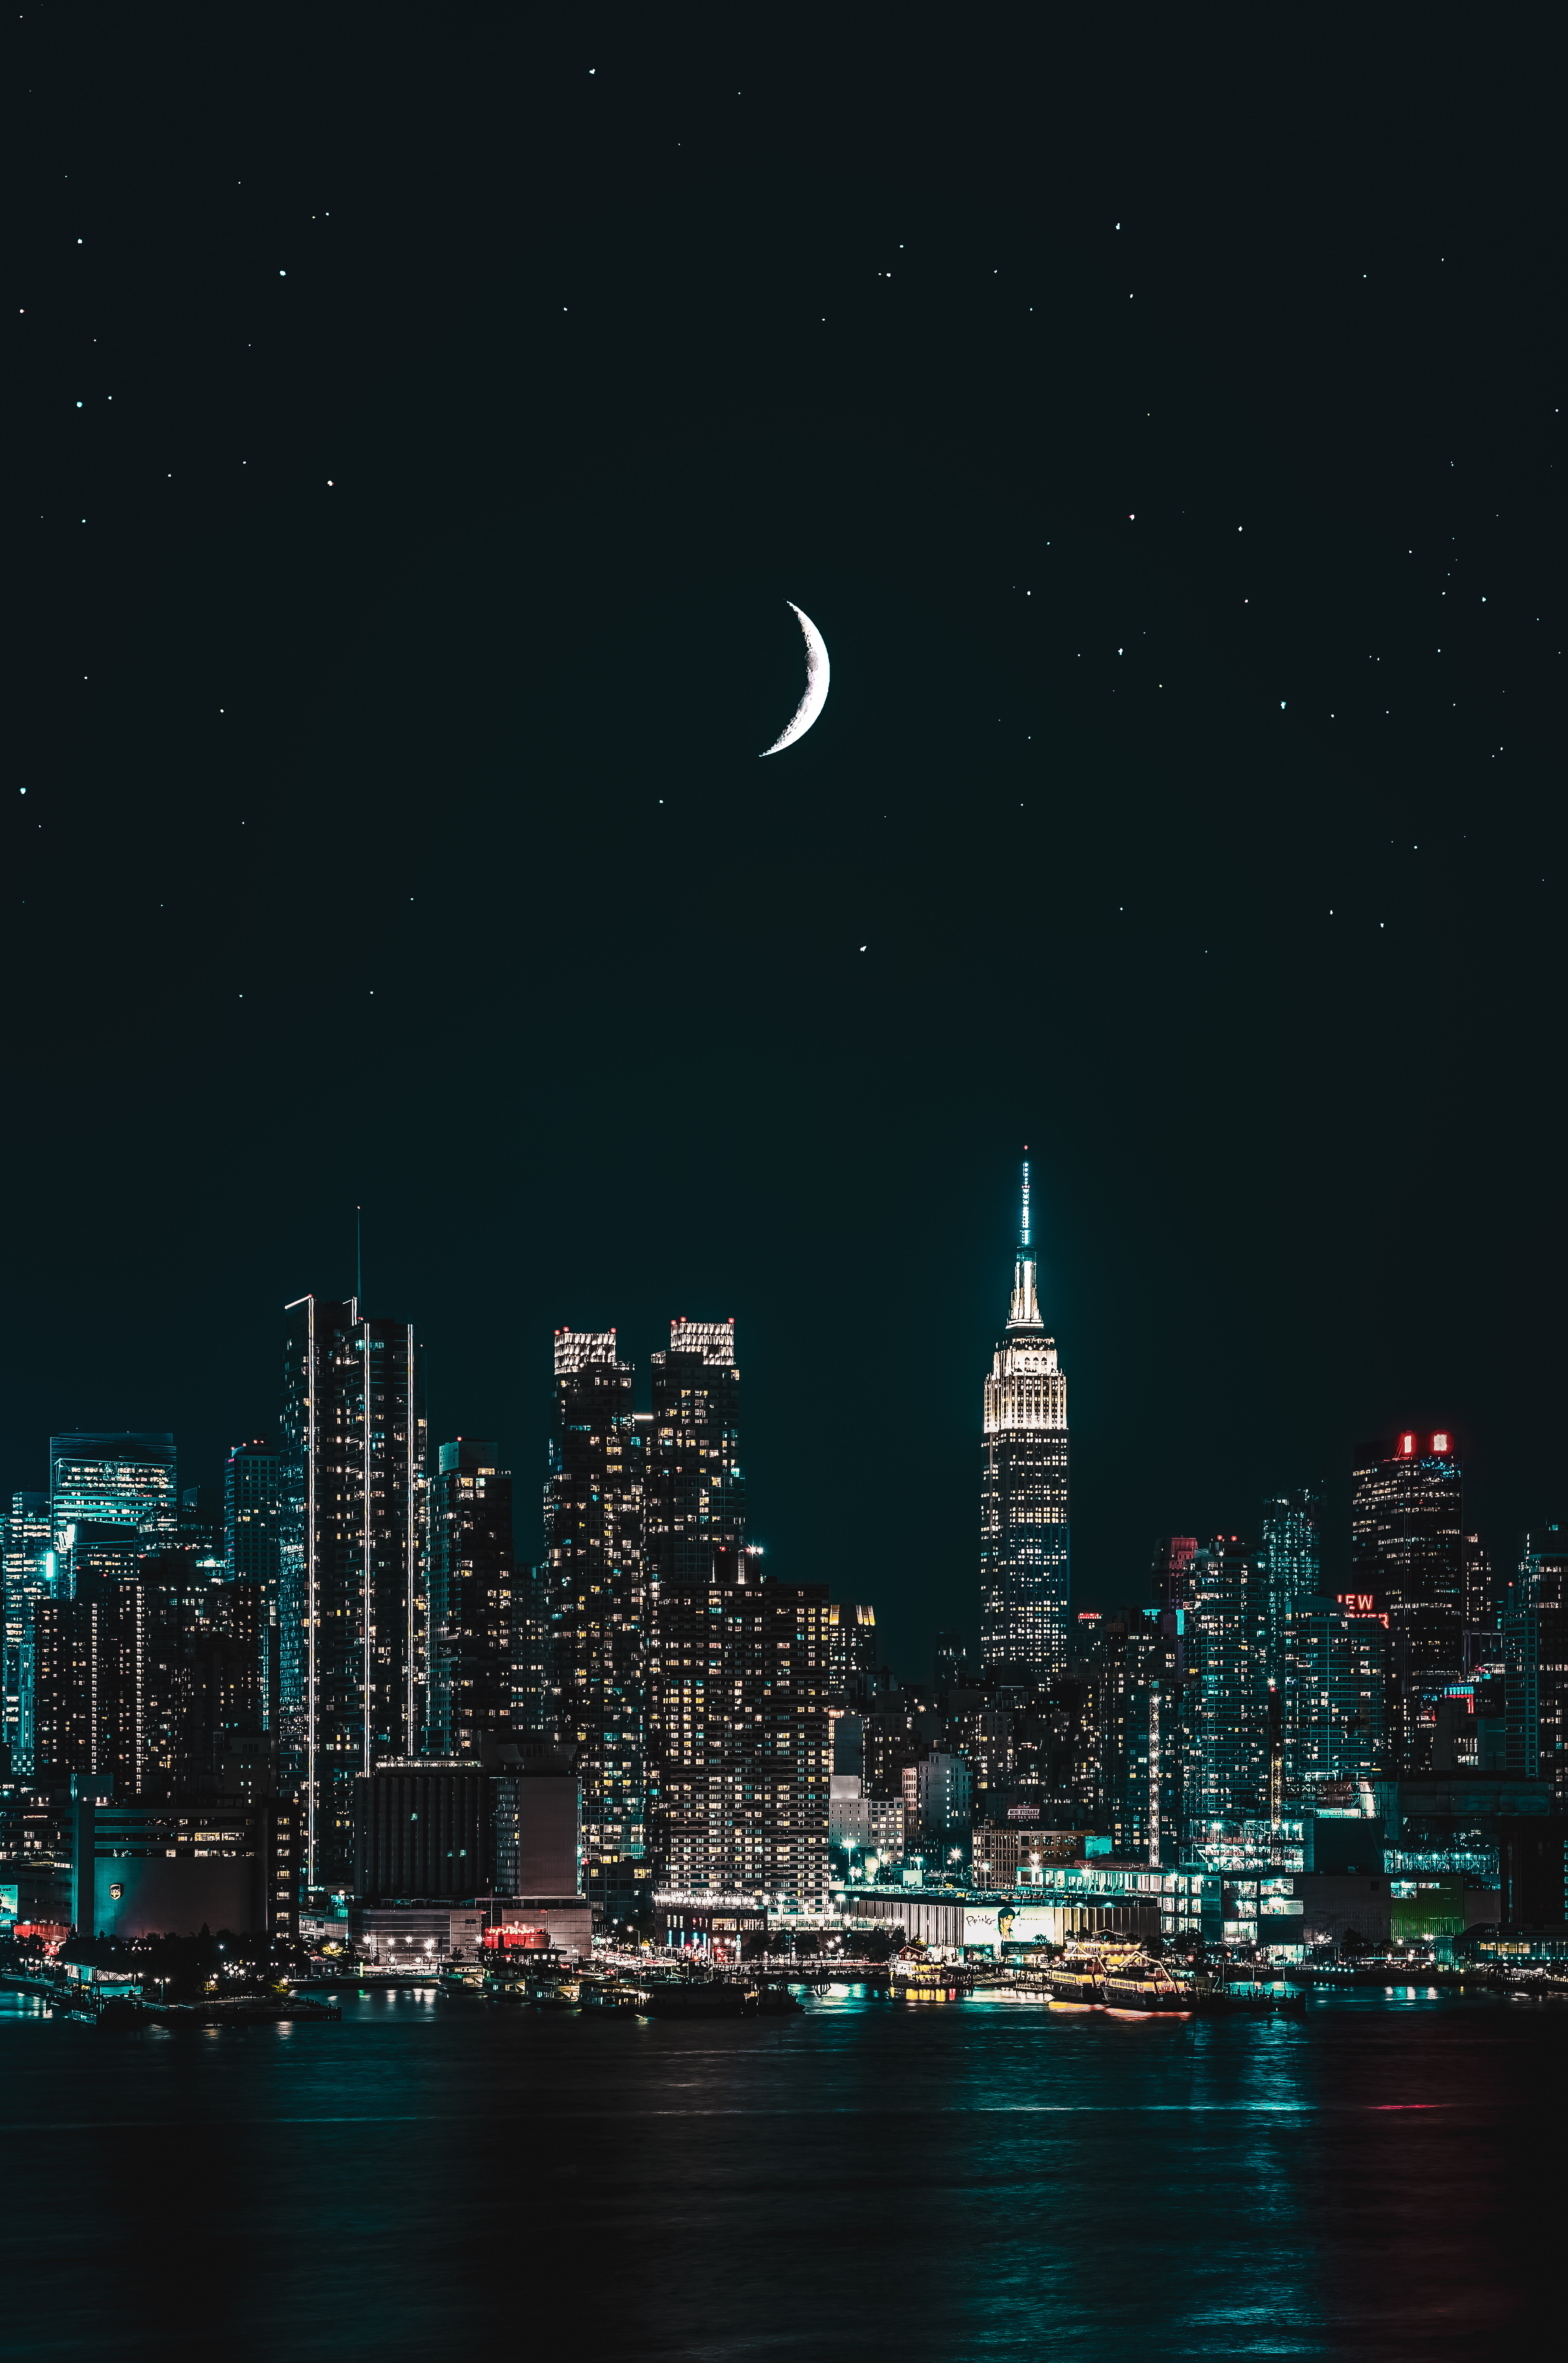 Skyline Photography of Buildings